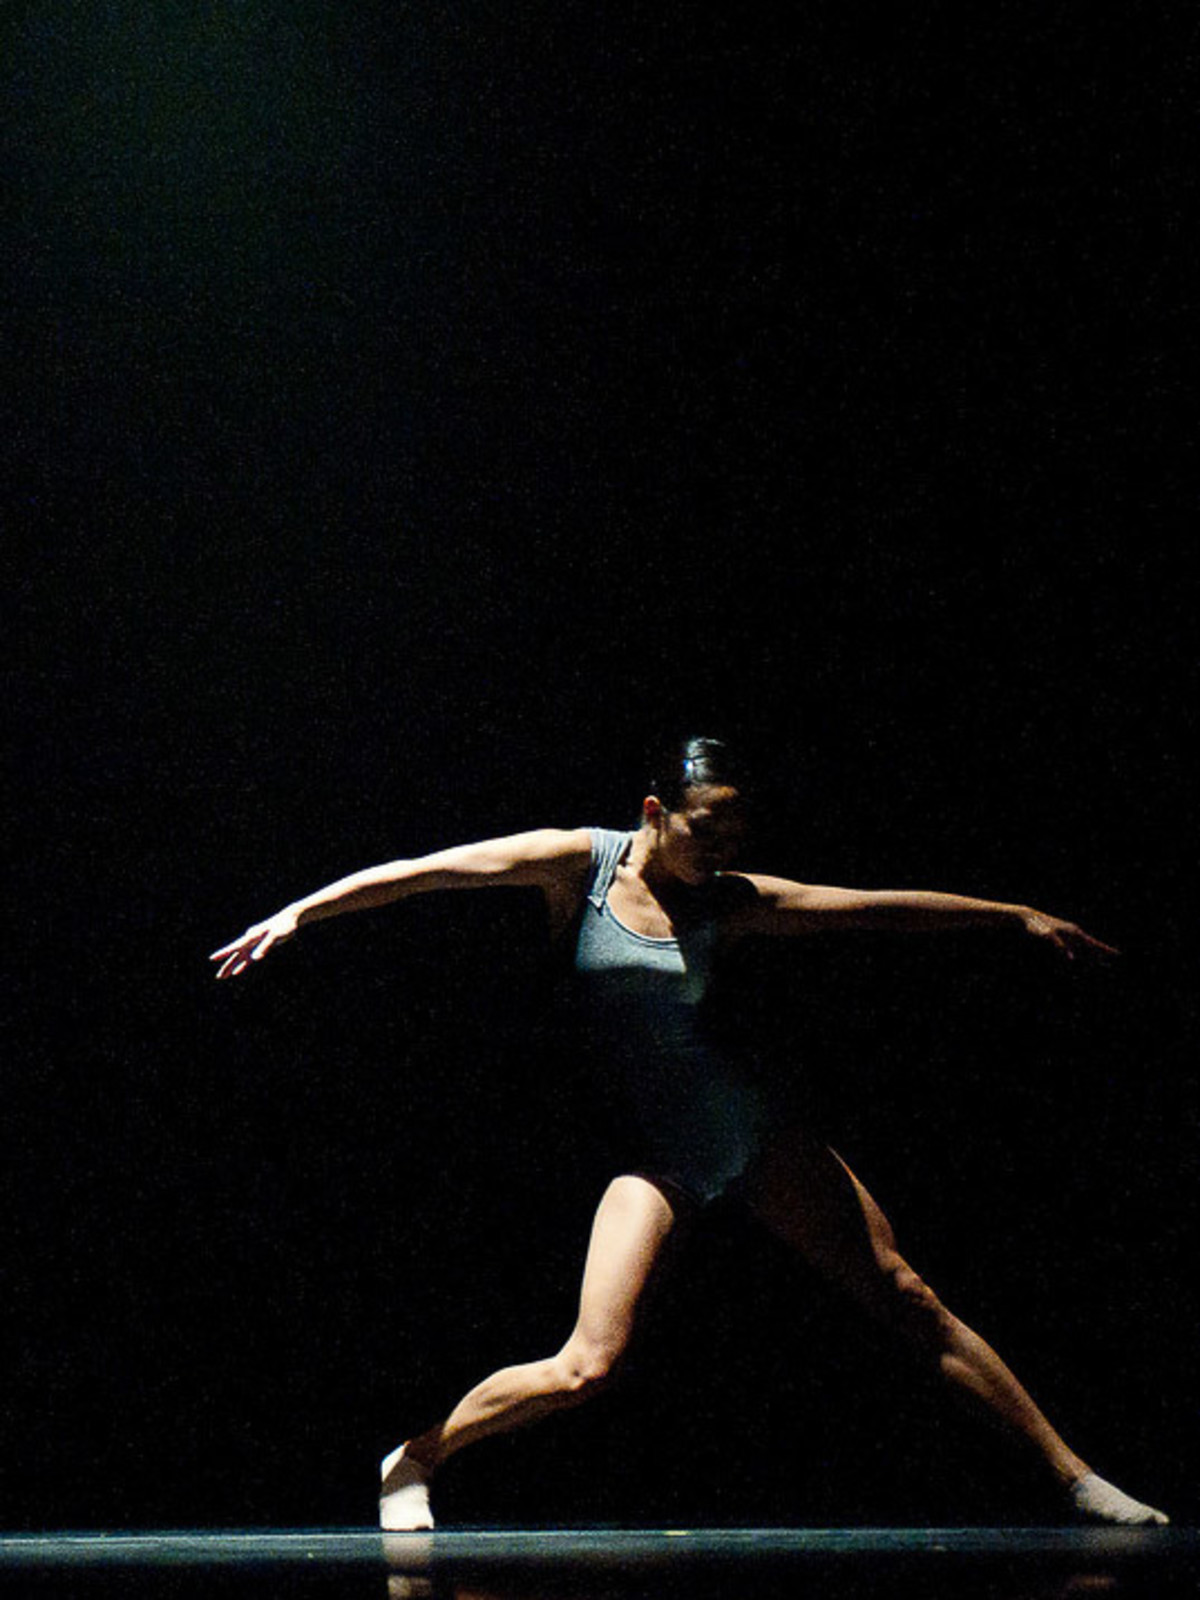 News_Nancy Wozny_Jacob's Pillow_Jessica Tong_Hubbard Street Dance Chicago_Blanco